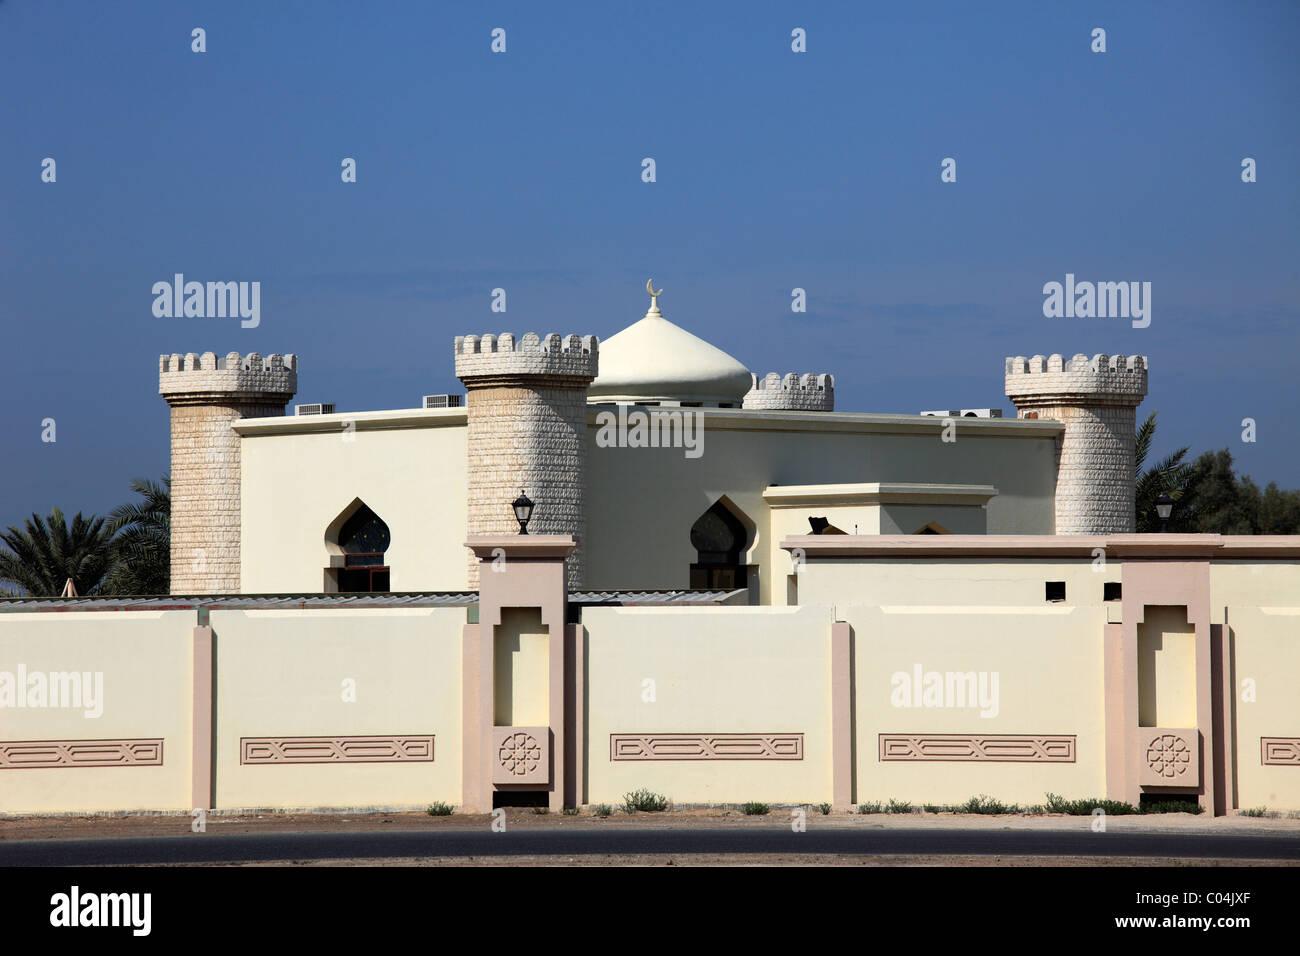 United Arab Emirates, Ajman, a part of the Diwan, Ruler's Palace, - Stock Image